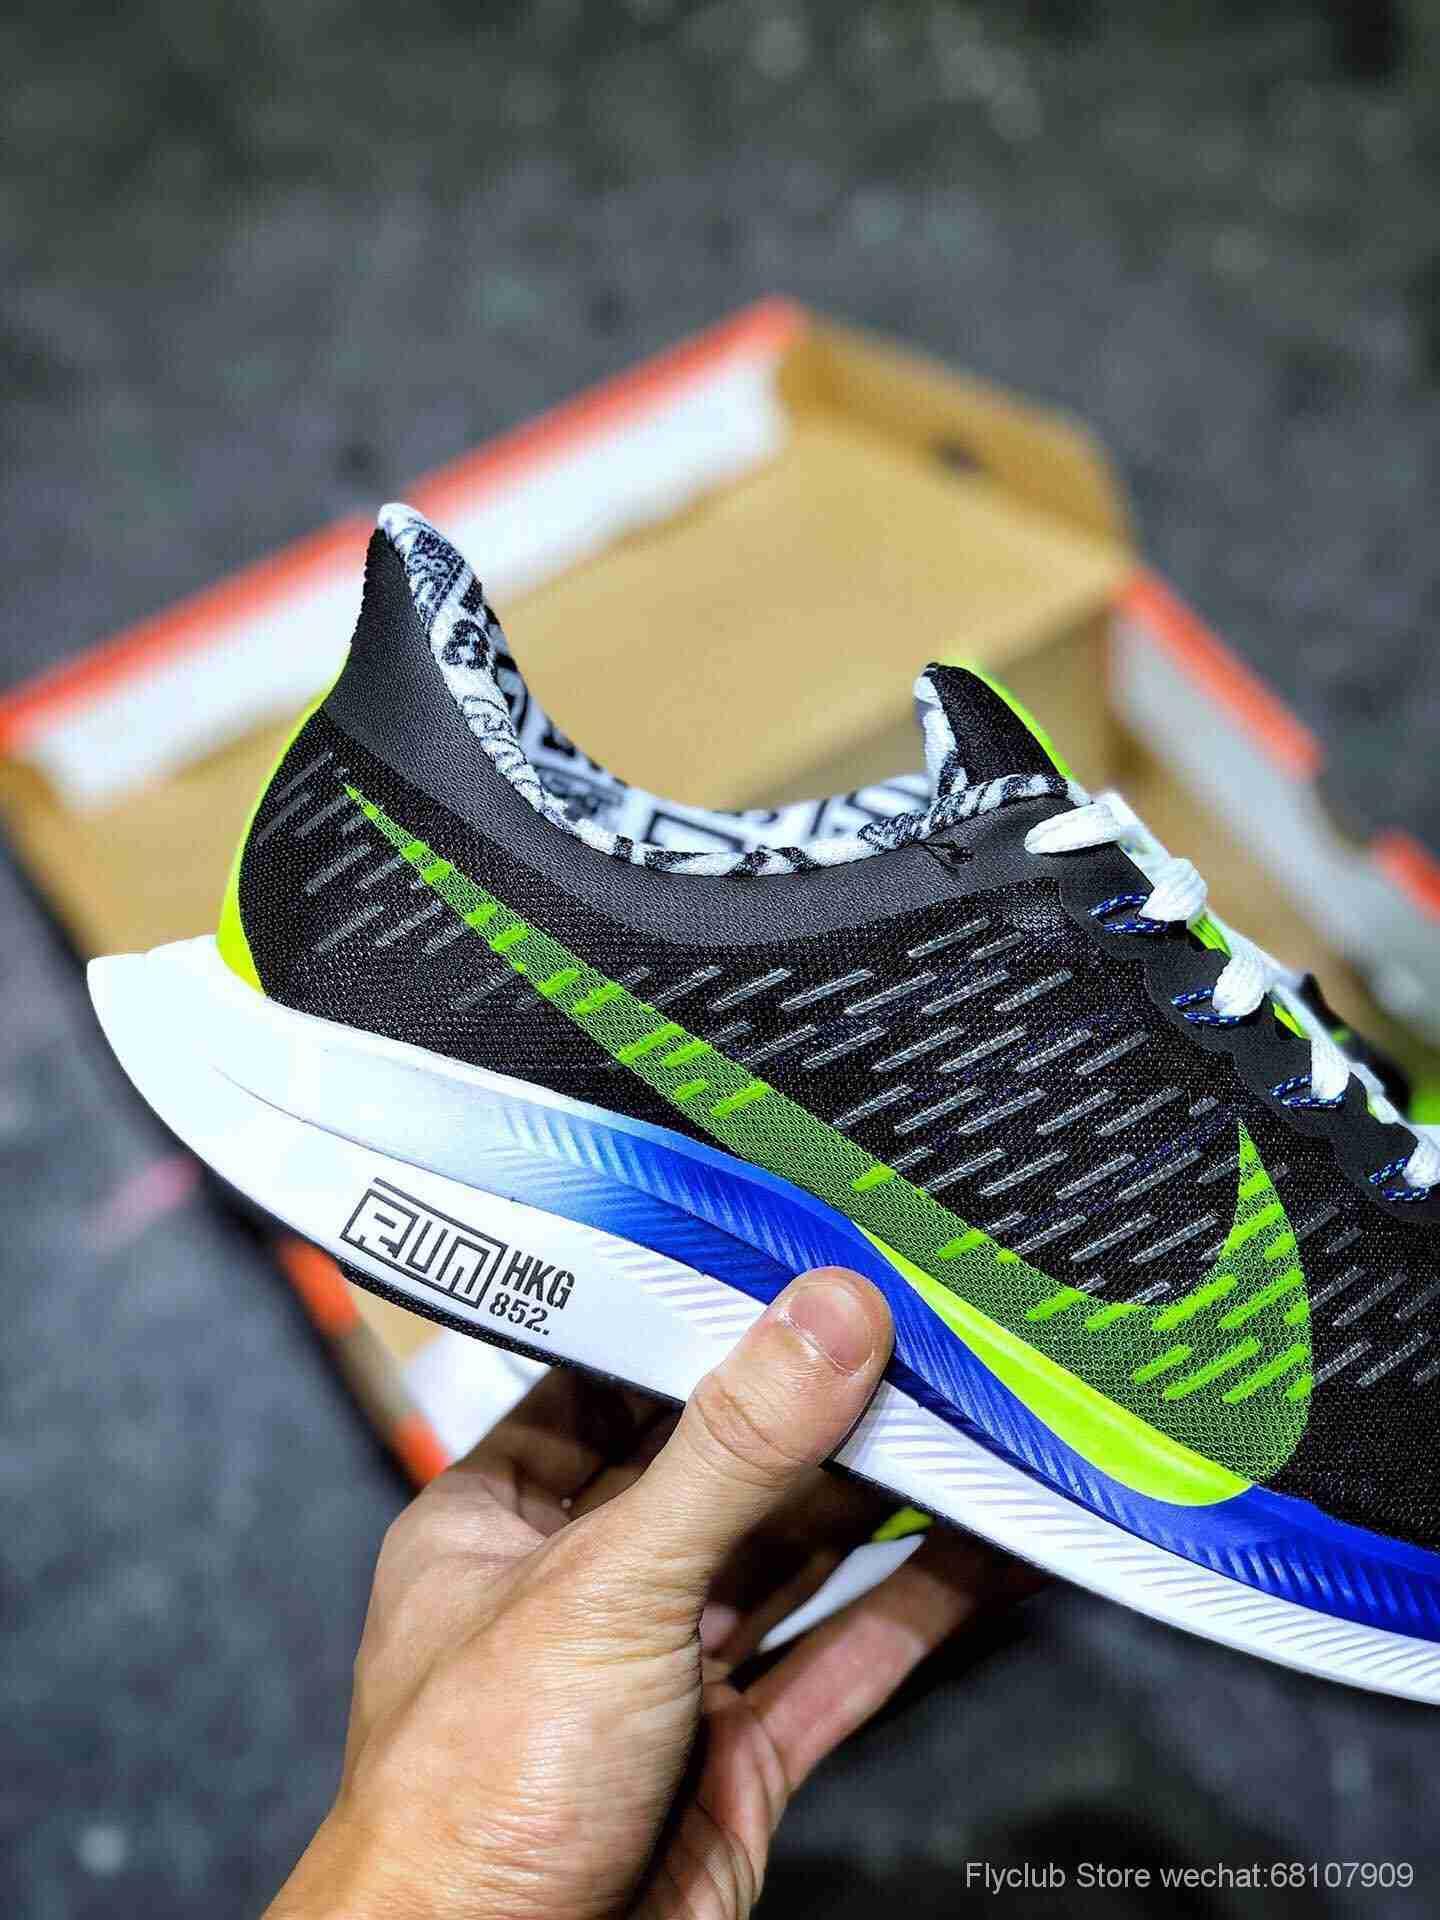 4c09d2990d72 公司级原盒原标正确版本新配色正式出货香港限定配色AJ4114- XP气垫正确双层底 Nike Zoom Pegasus Turbo X React  飞马马拉松跑鞋尺码:39 40 40.5 41 42 42.5 43 44 ...